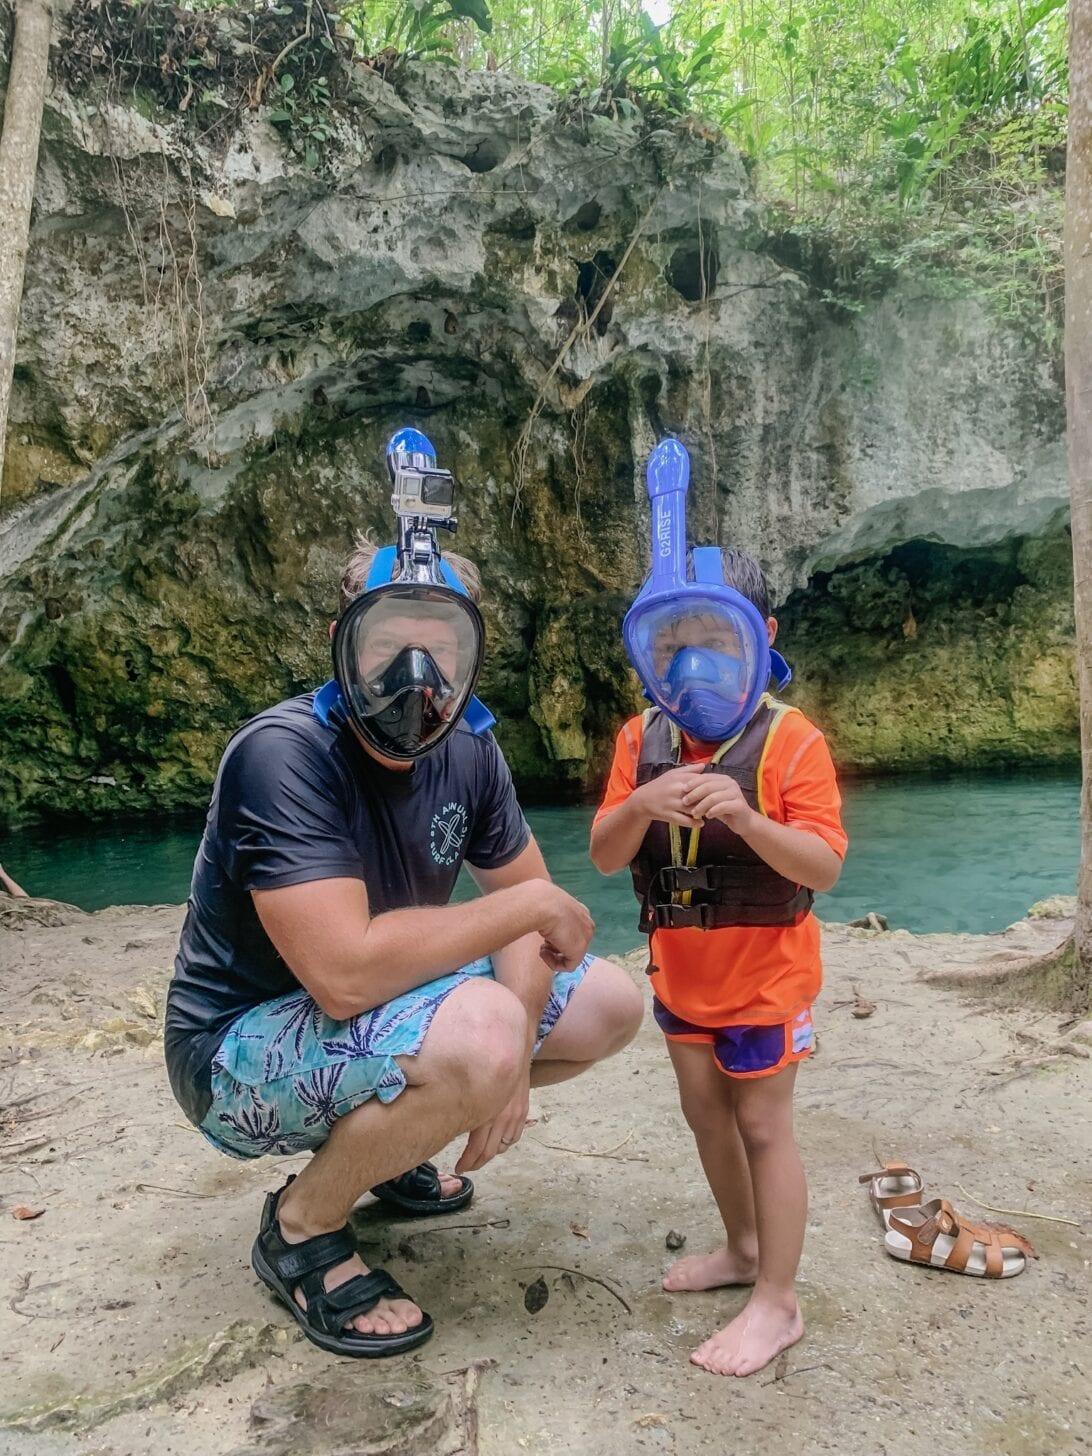 kid snorkles, family snorkel, Cenote snorkeling, Tulum snorkeling